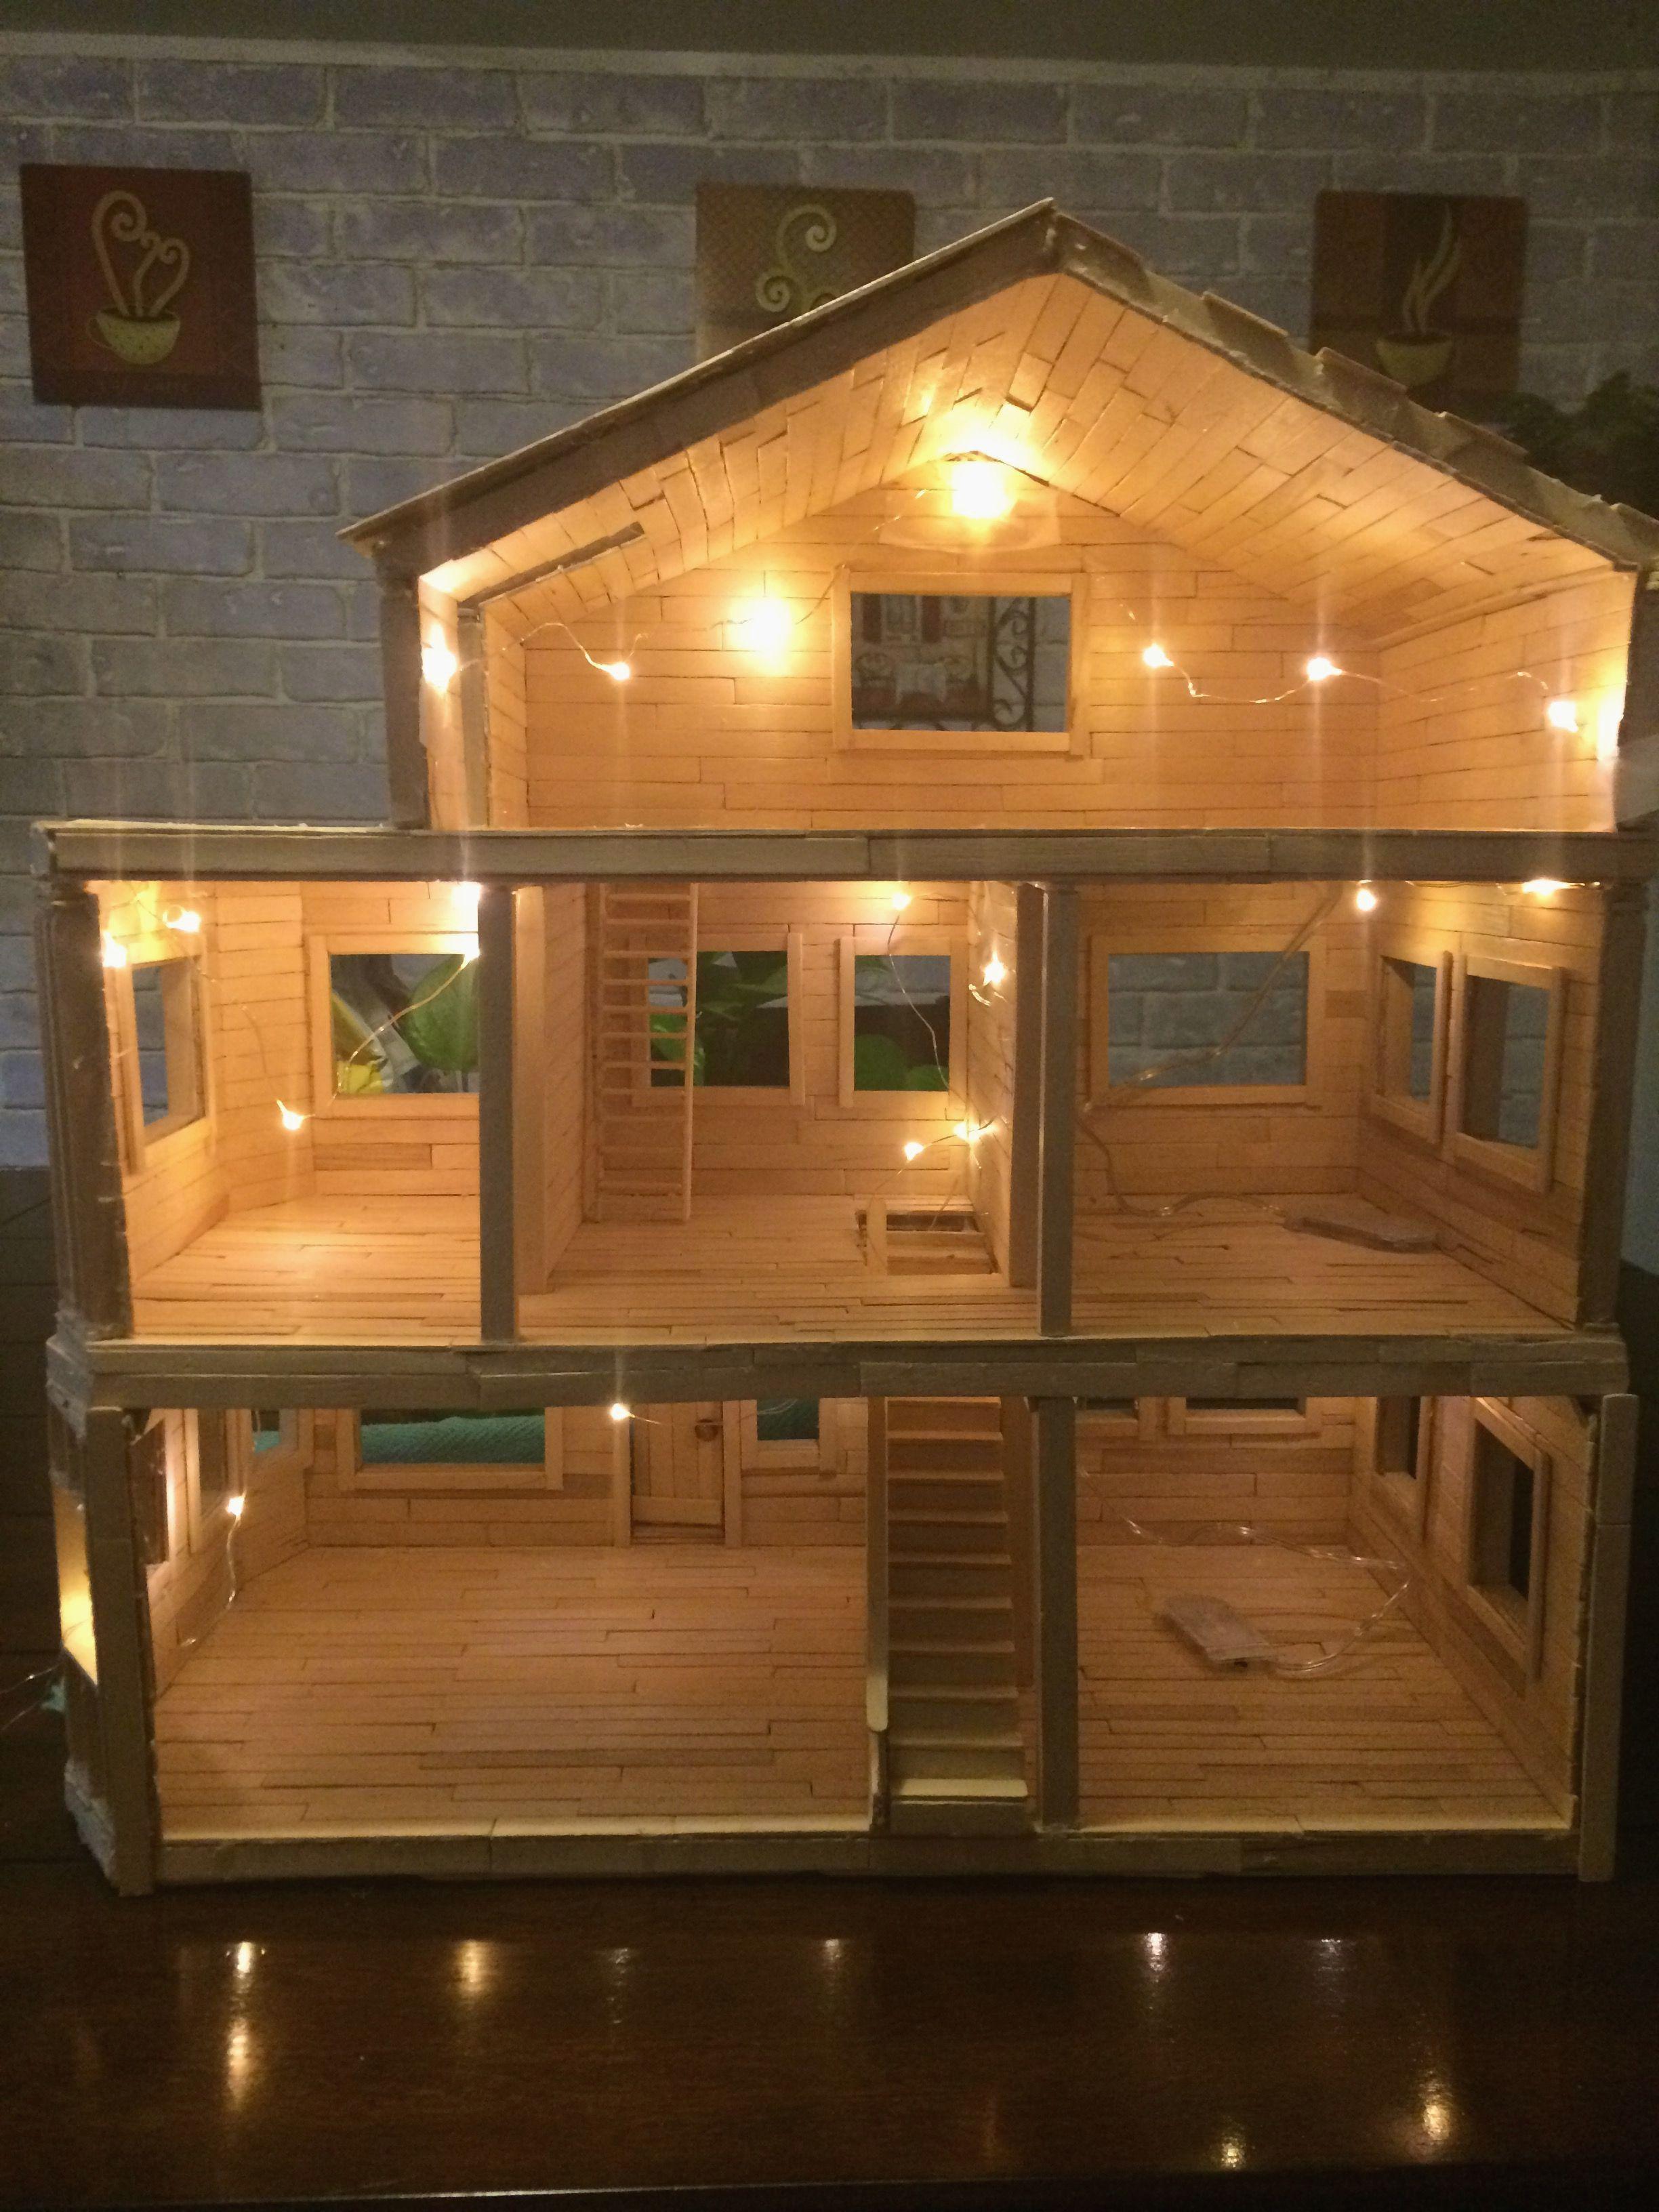 24 Fresh Popsicle Stick House Plans